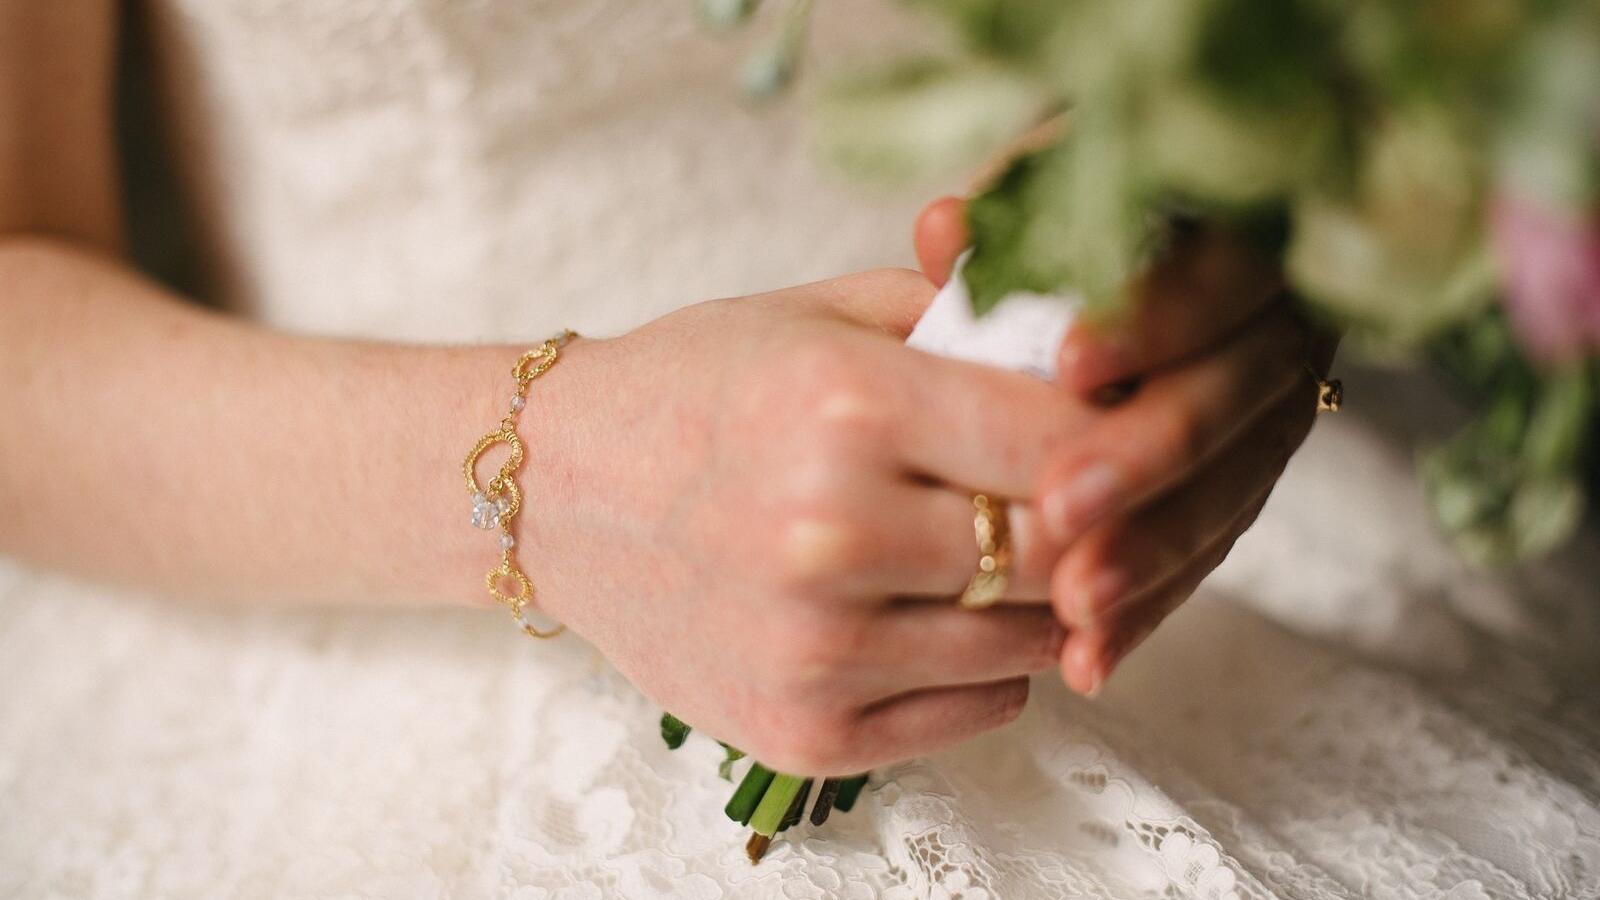 Bespoke bracelet